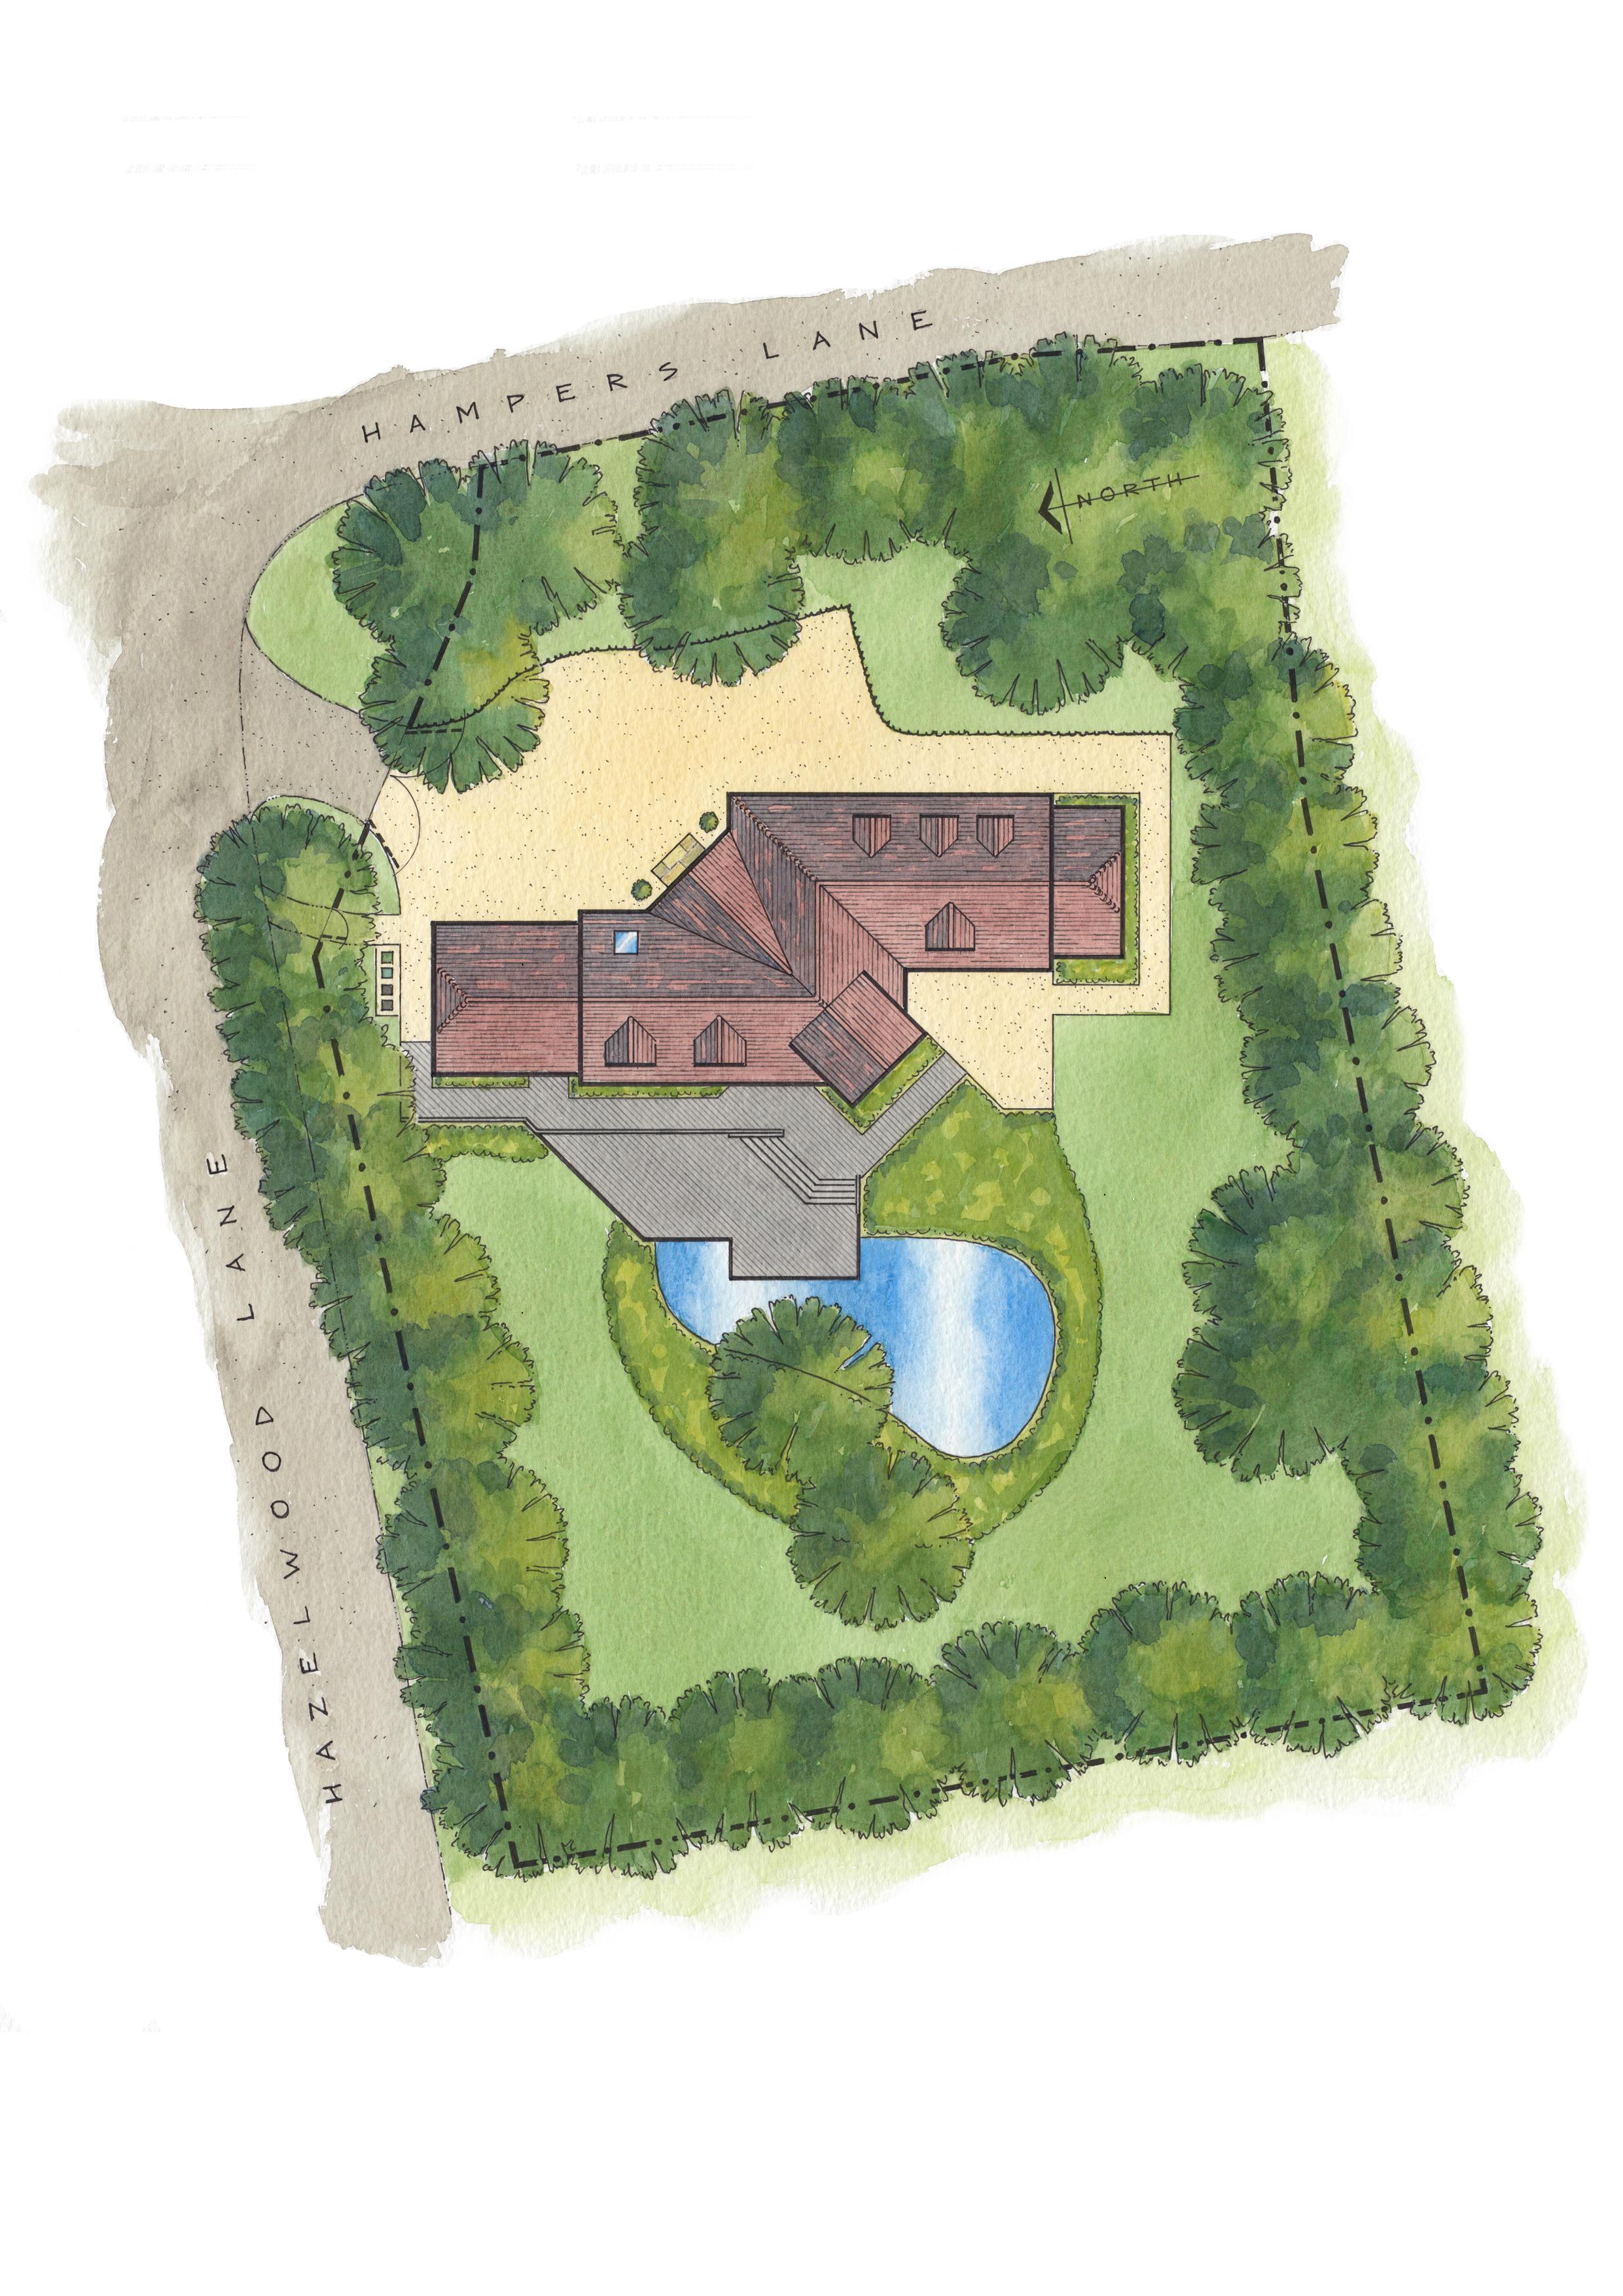 Hampers Lane Artist Impression Plan View